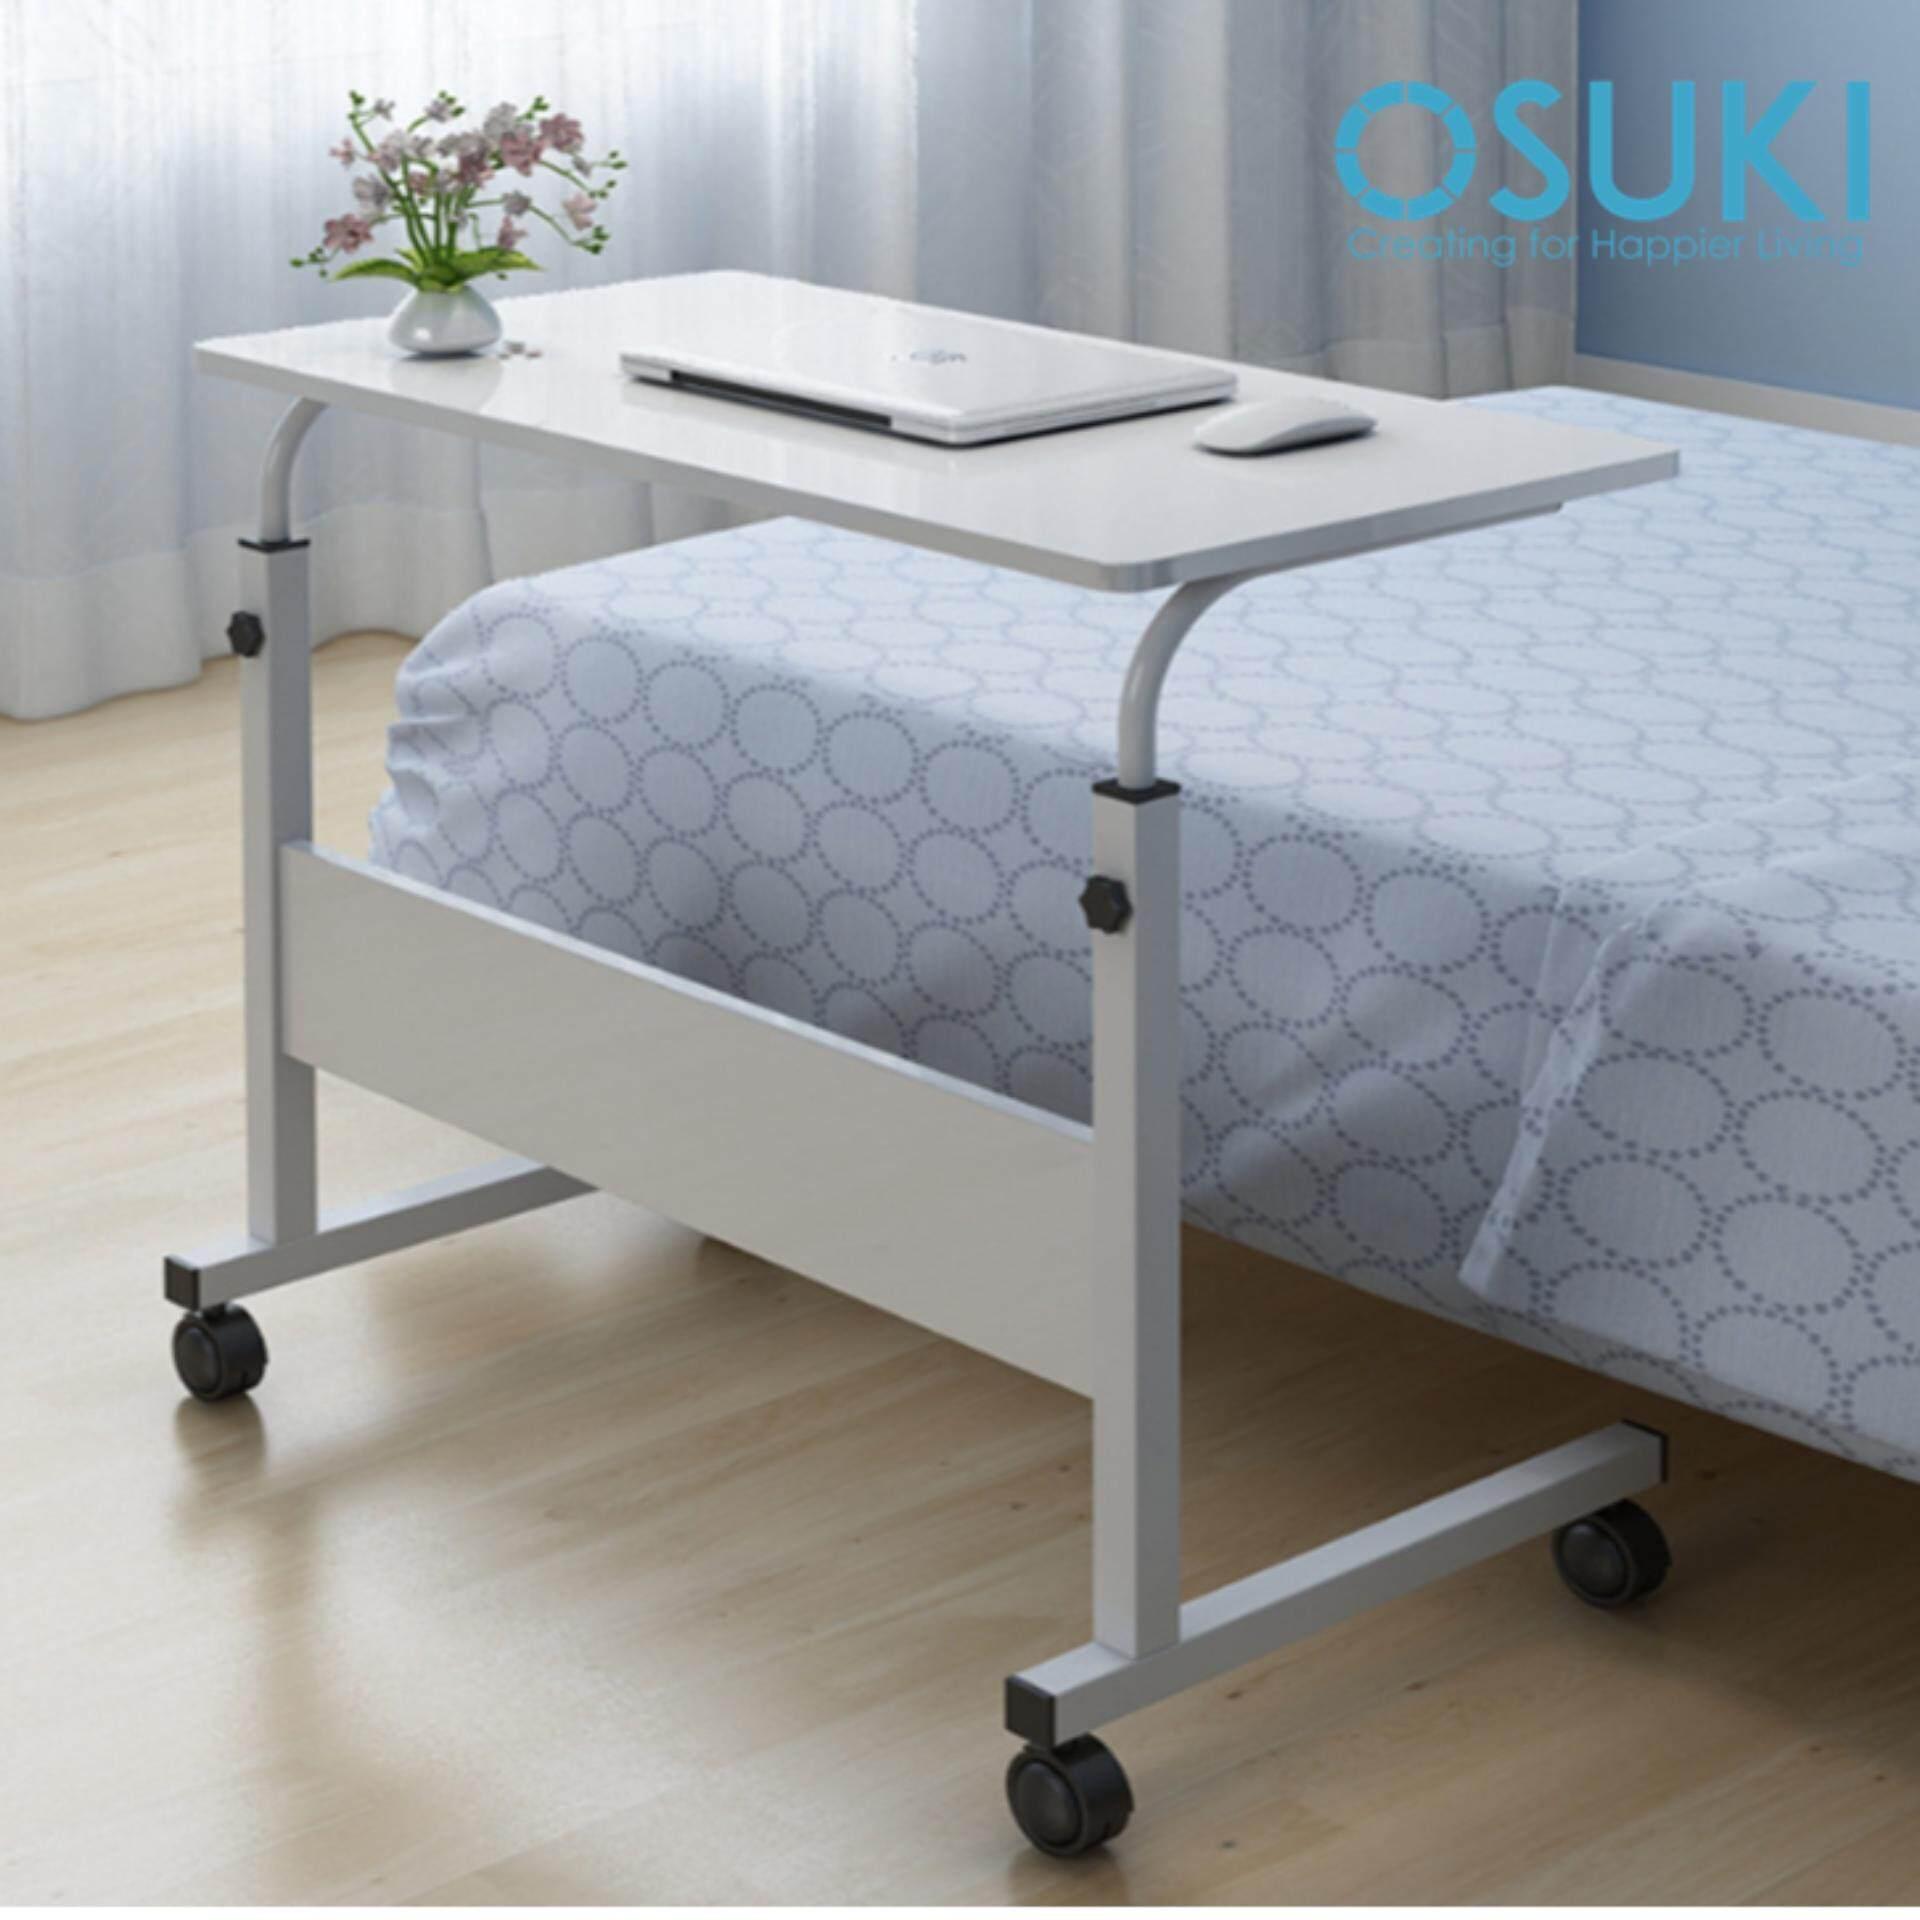 Osuki Height Adjule Table 60x40cm With Wheels Laptop Desk White Malaysia